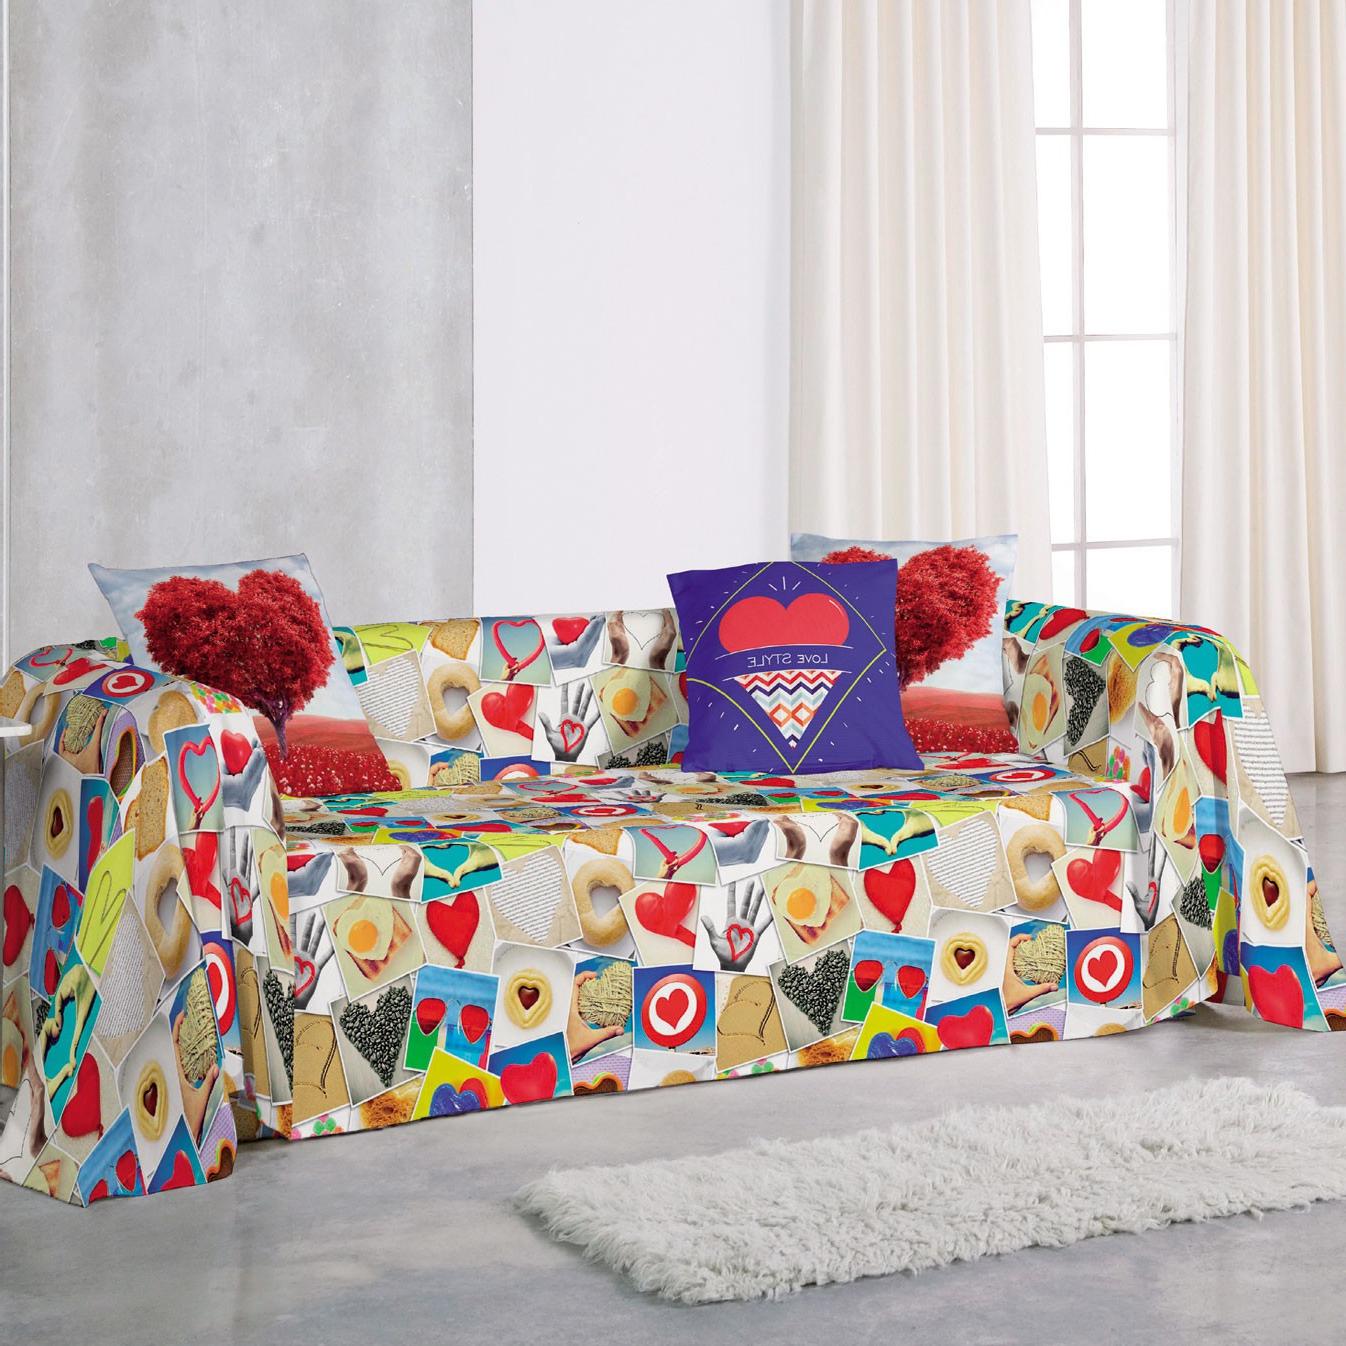 Foulard sofa Budm Foulards Para sofà Lisos Y Estampados Textil Salà N Costuratex